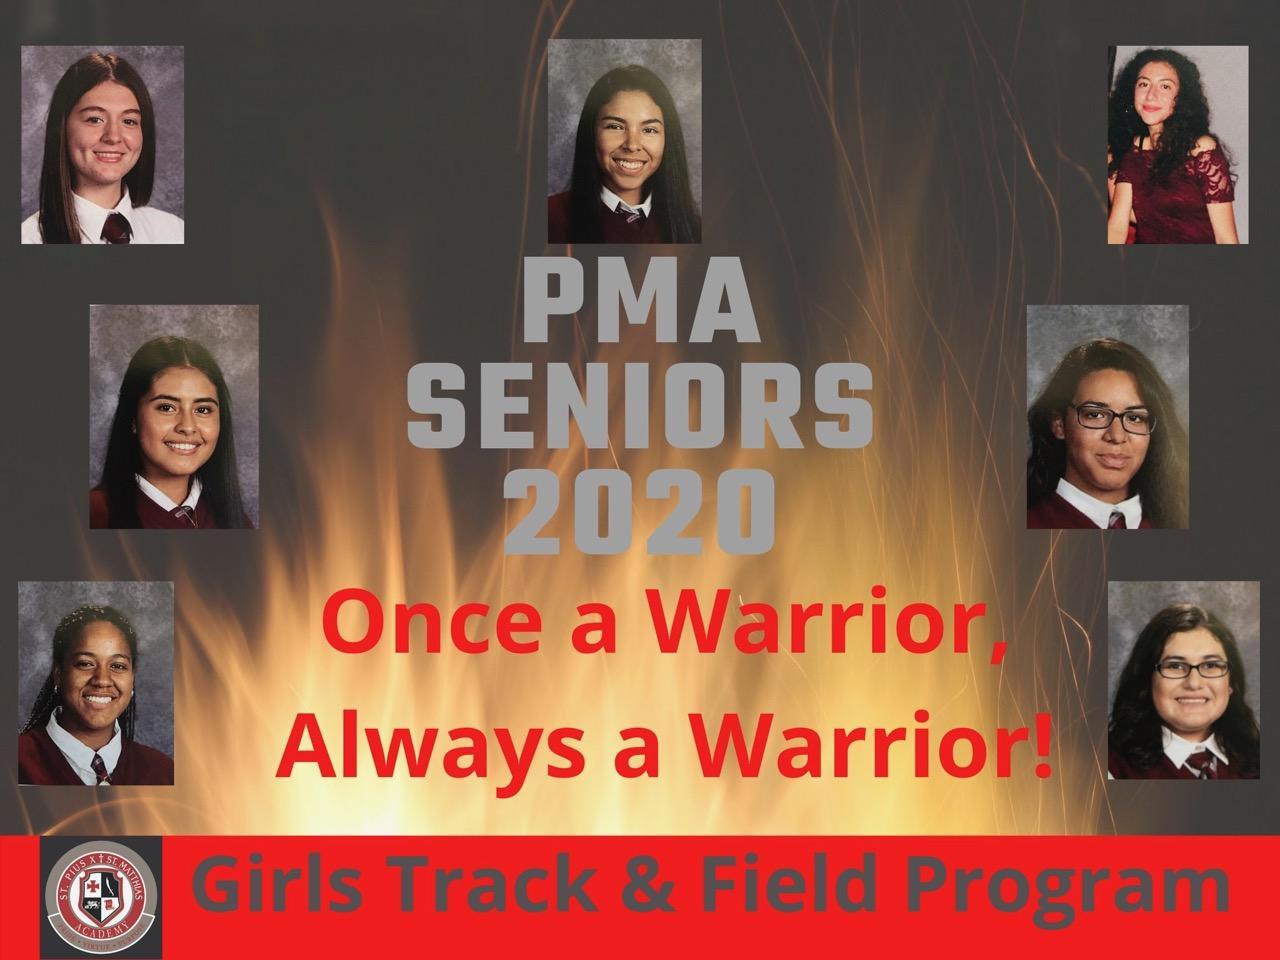 2020 Girls Track & Field Seniors, We will miss you!